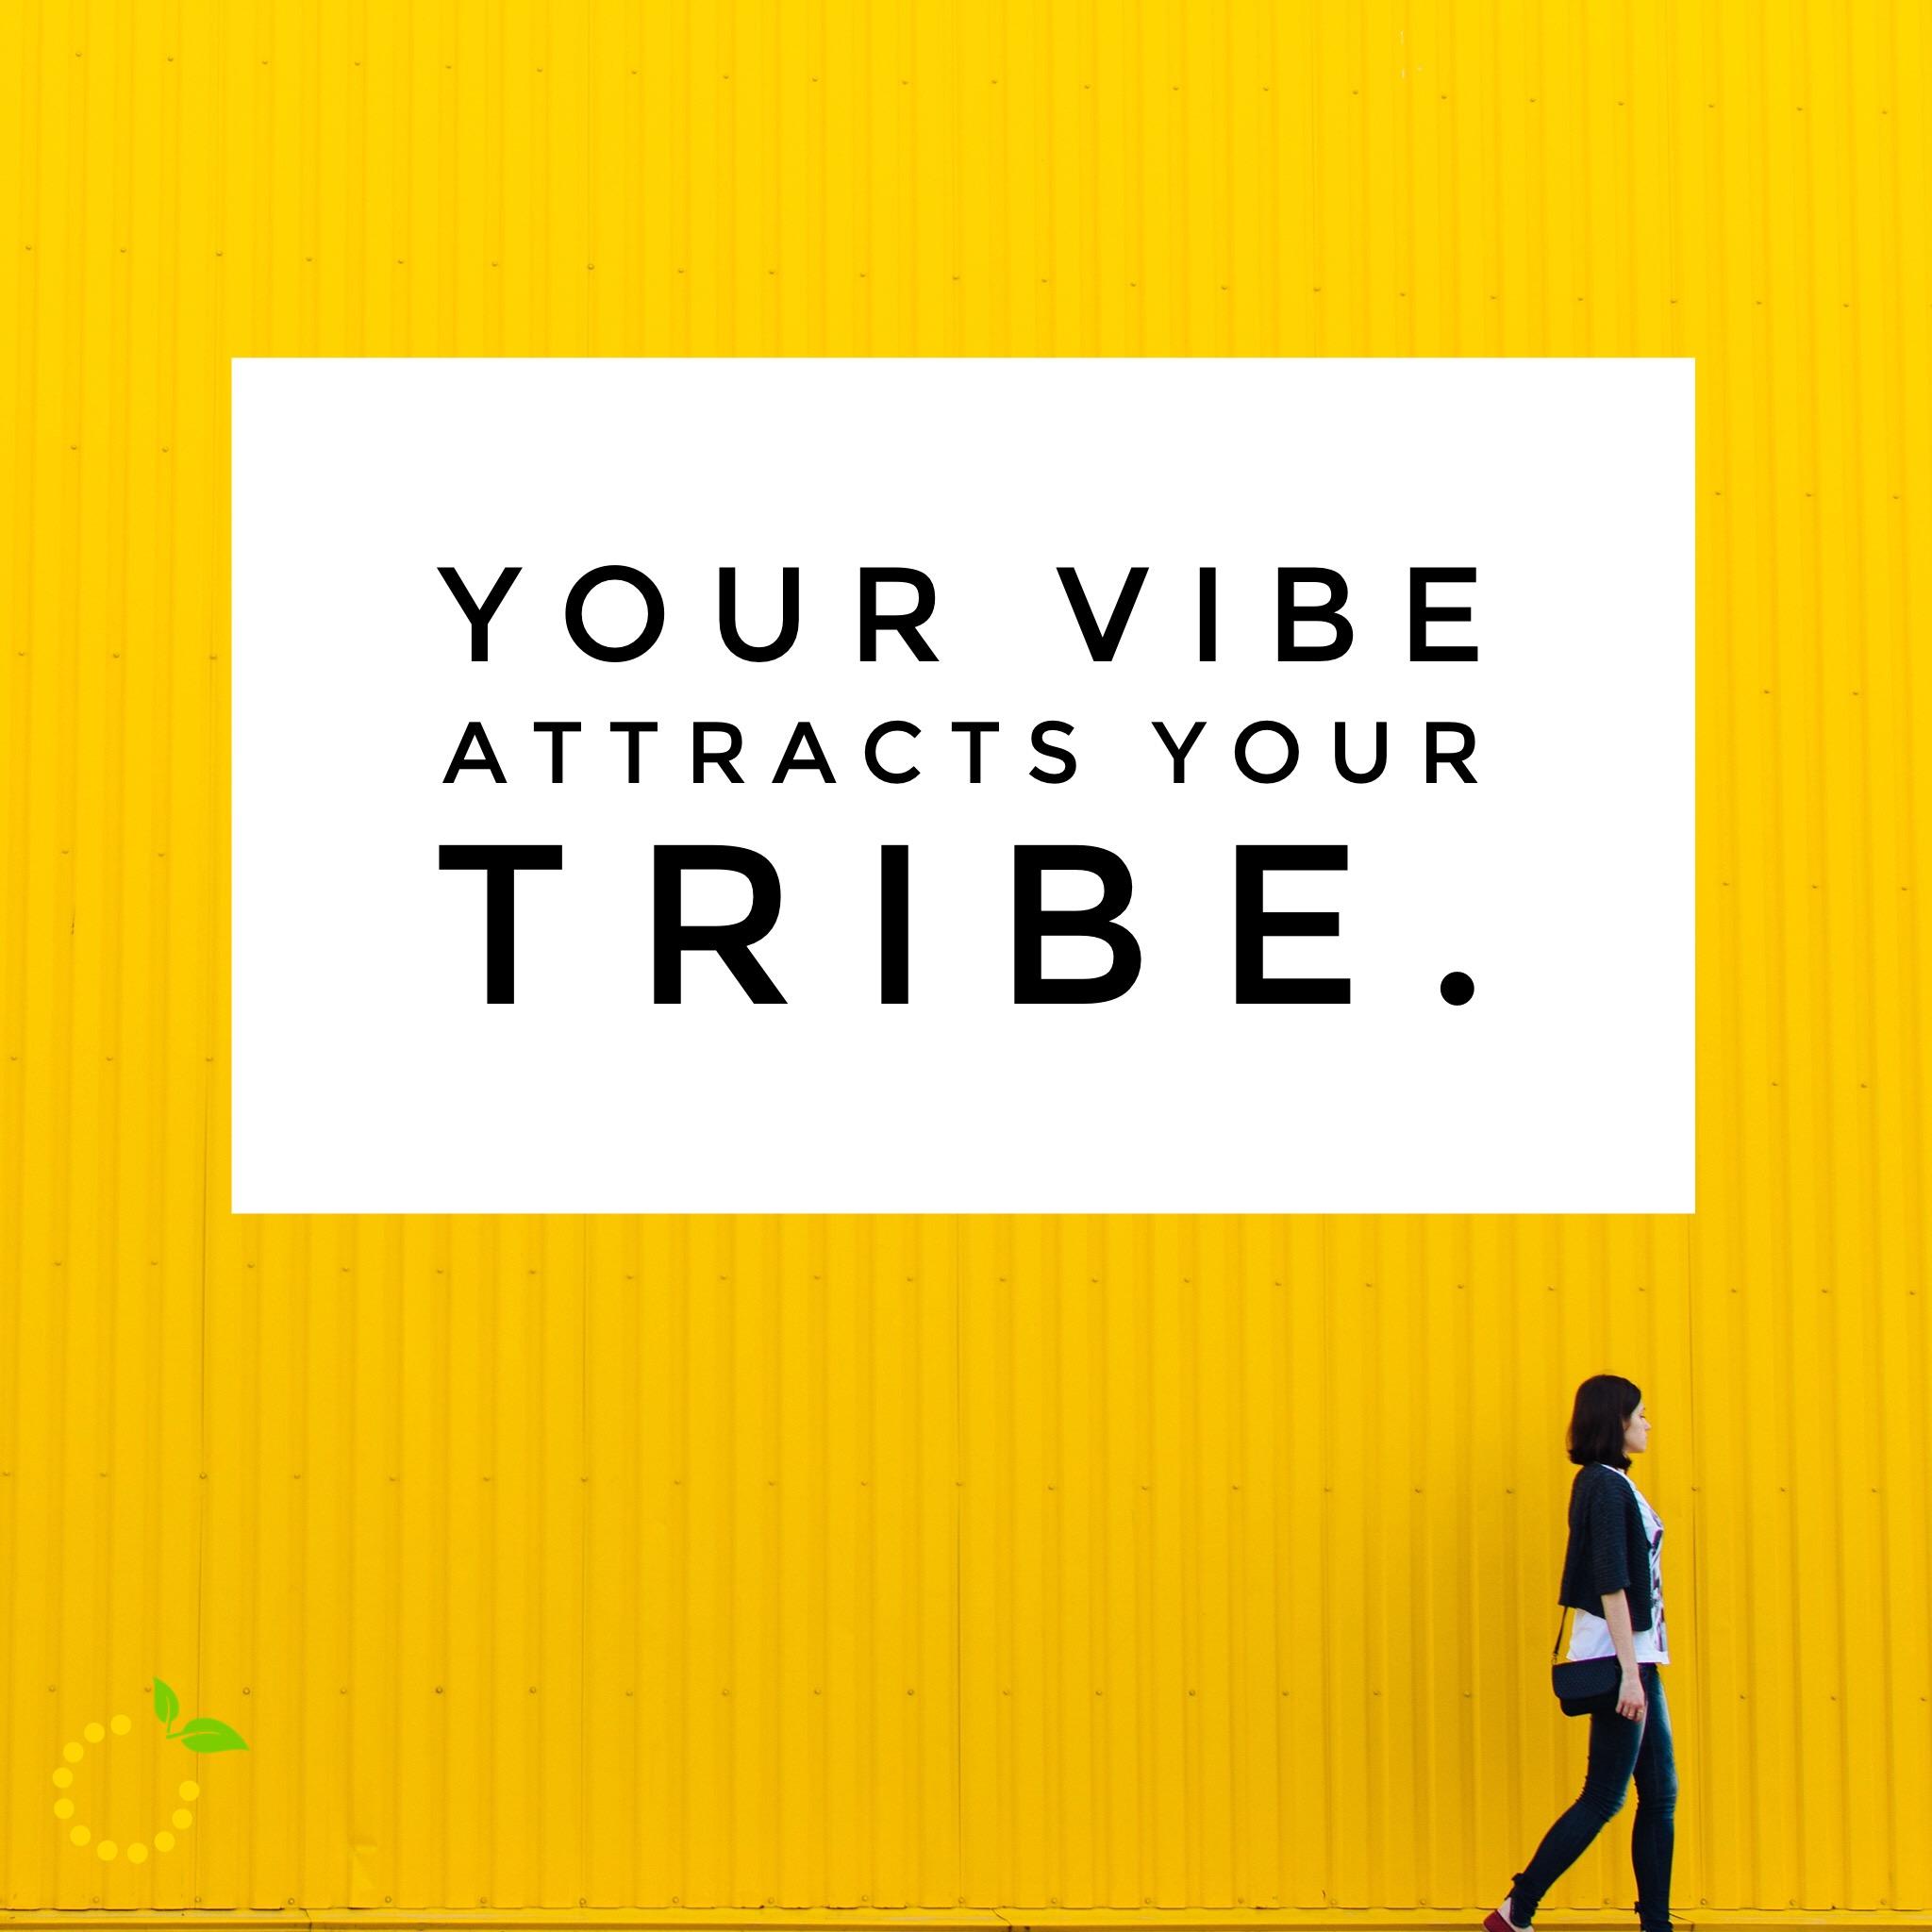 Tribe sweetlemonmade.com